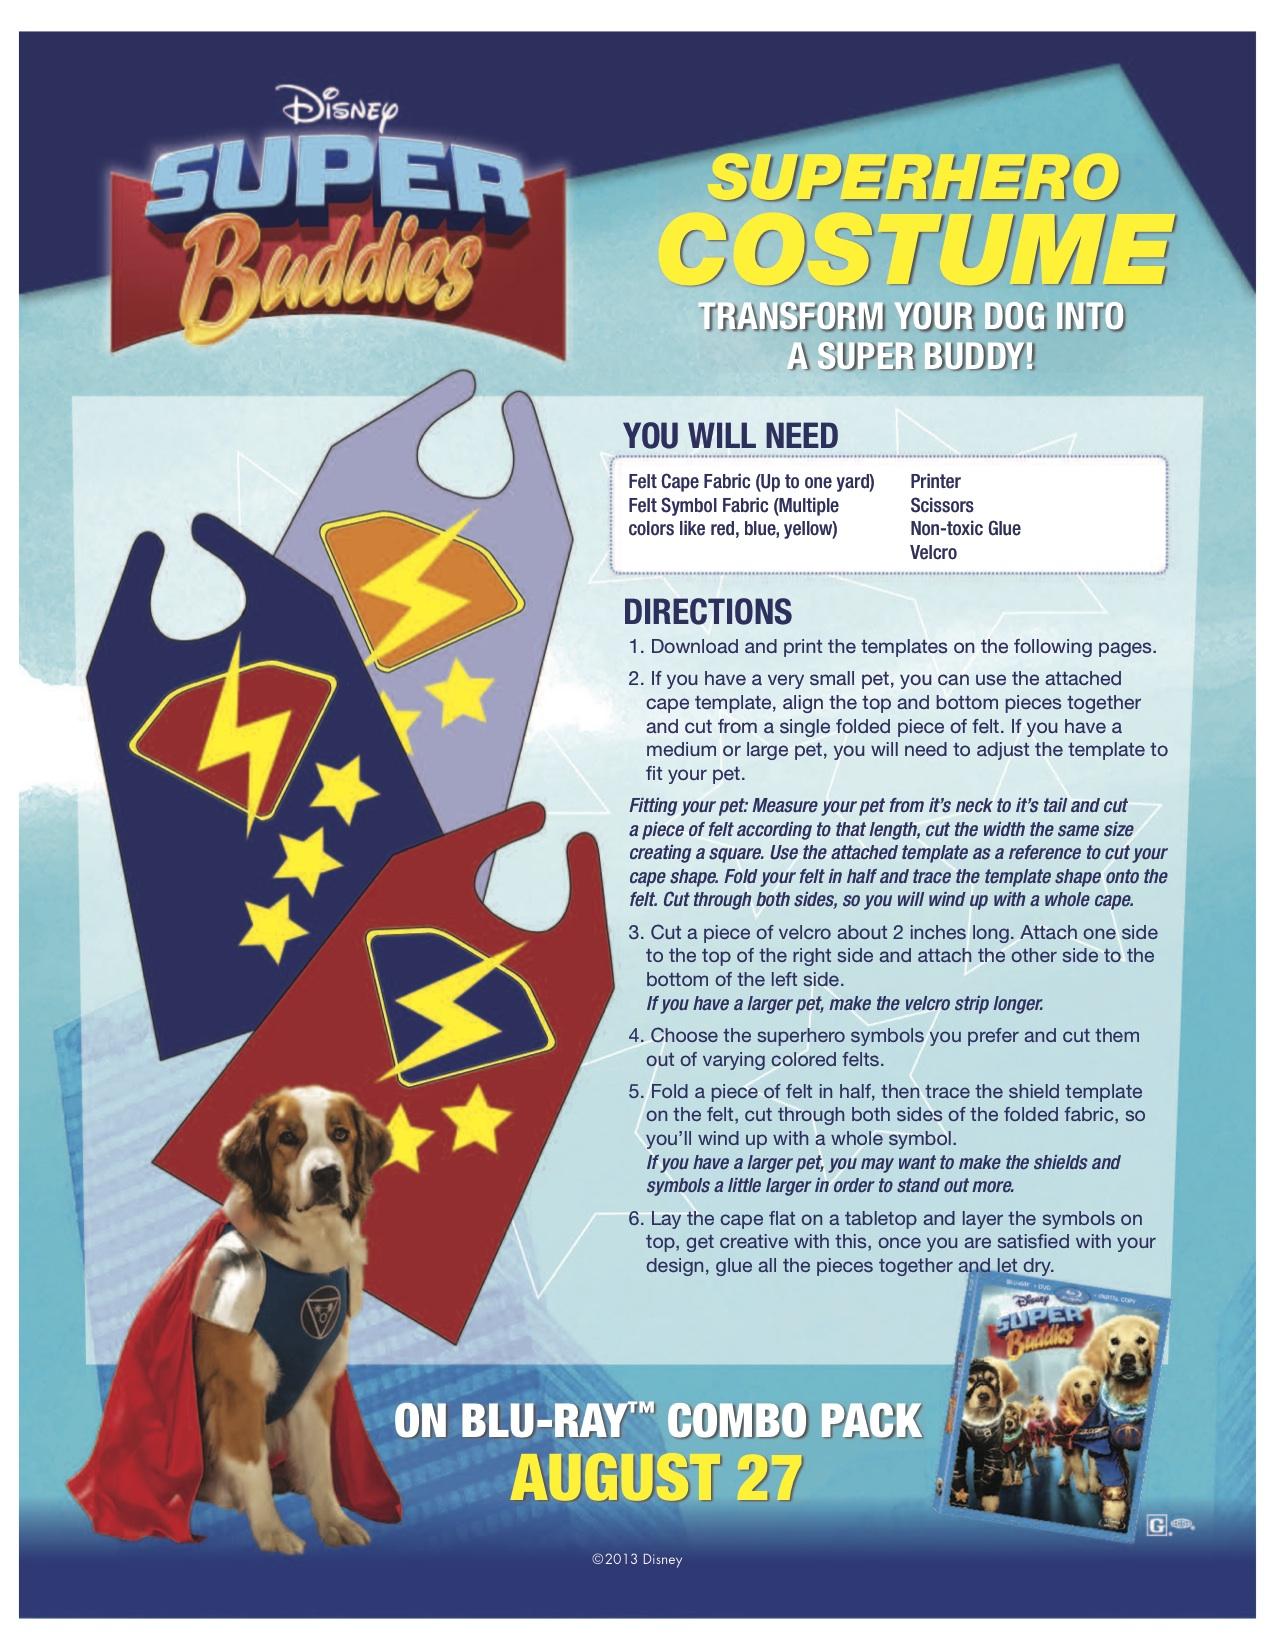 Disney DIY Super Hero Costume for Dogs